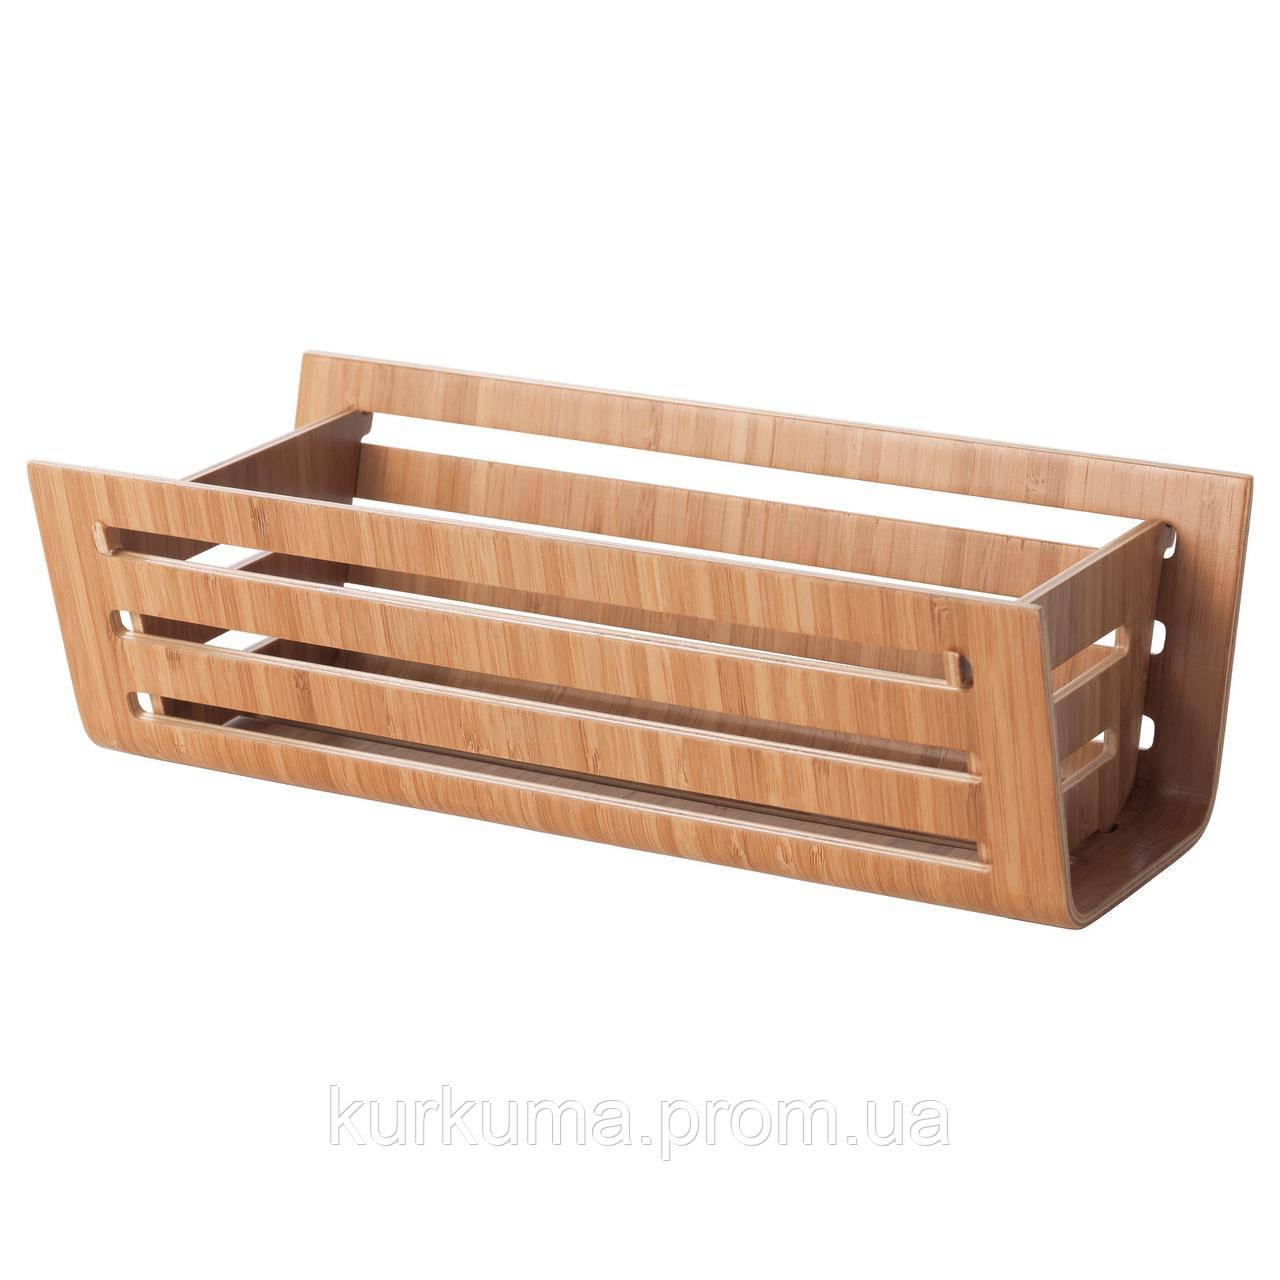 IKEA RIMFORSA Корзина, бамбук  (402.820.69)